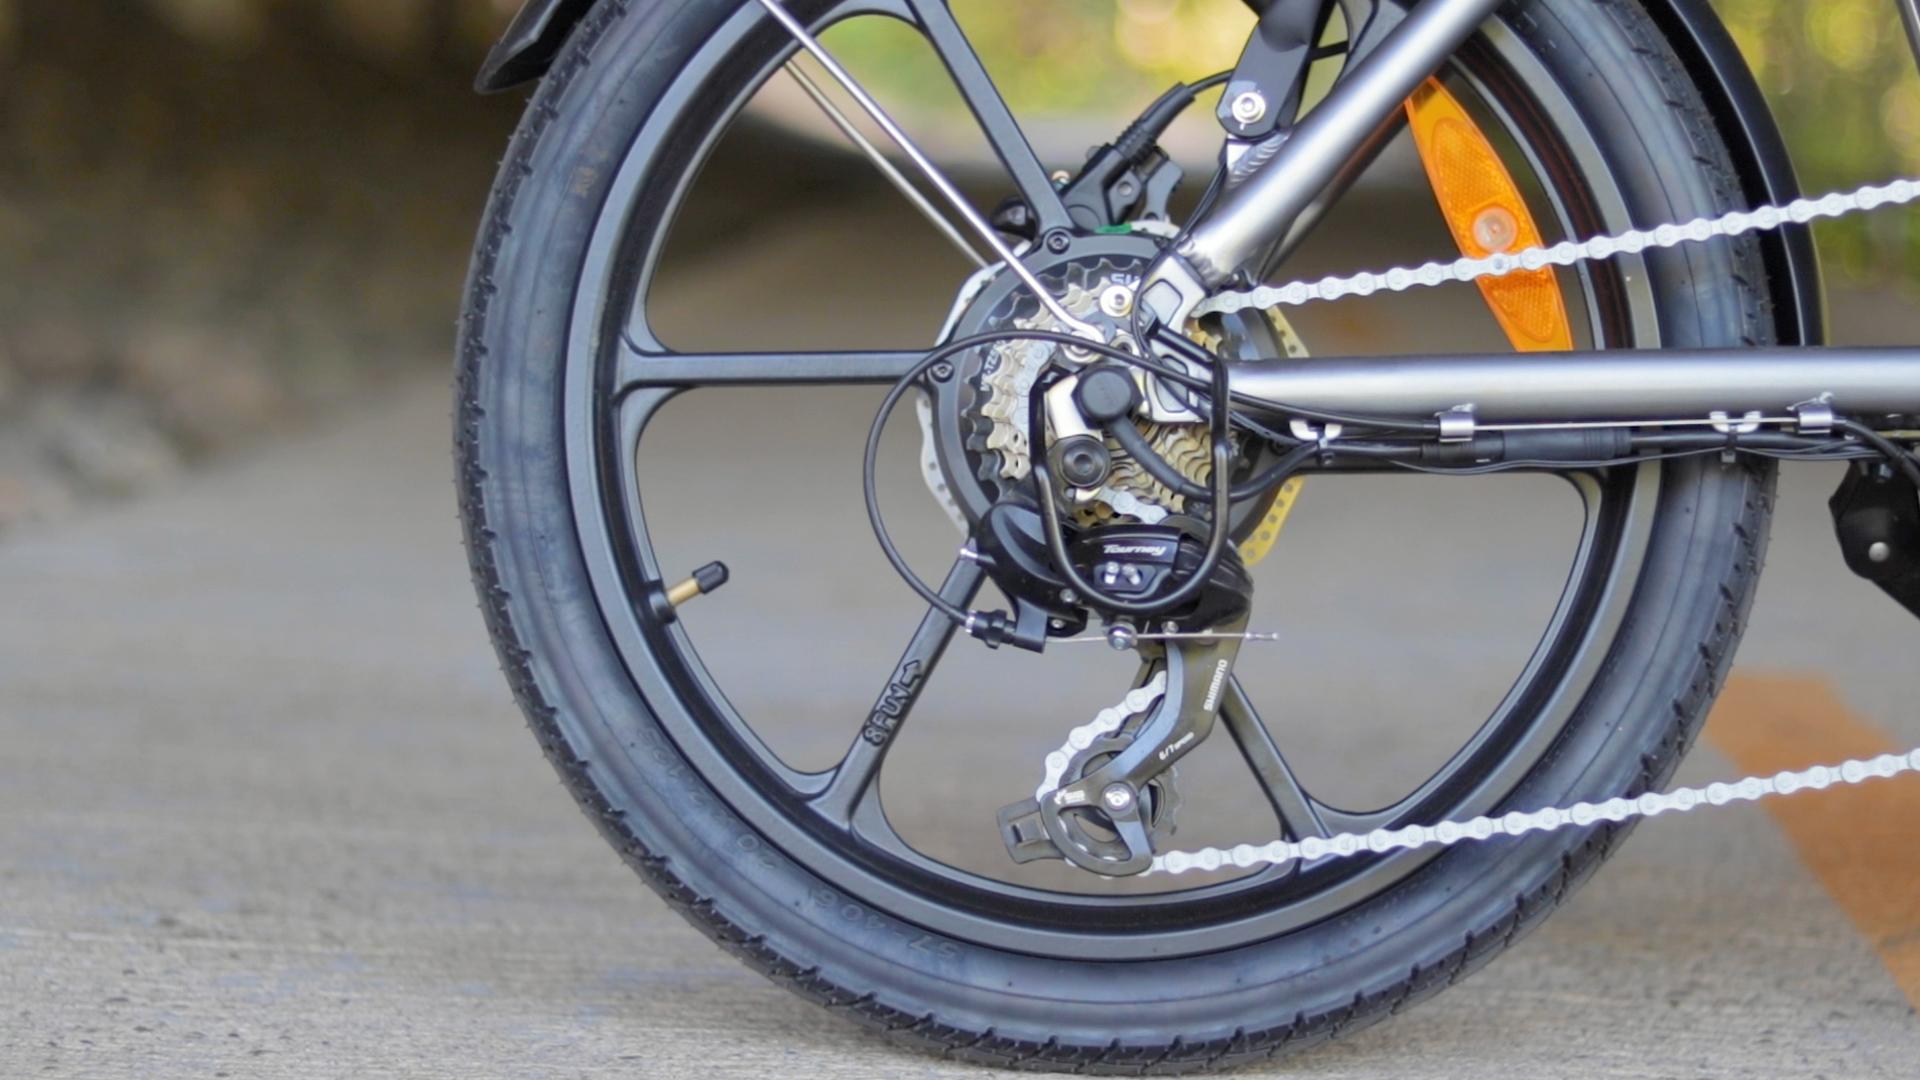 electrified-reviews-bagibike-b10-foldign-electric-bike-review-shimano-tourney-derailleur-3.jpg